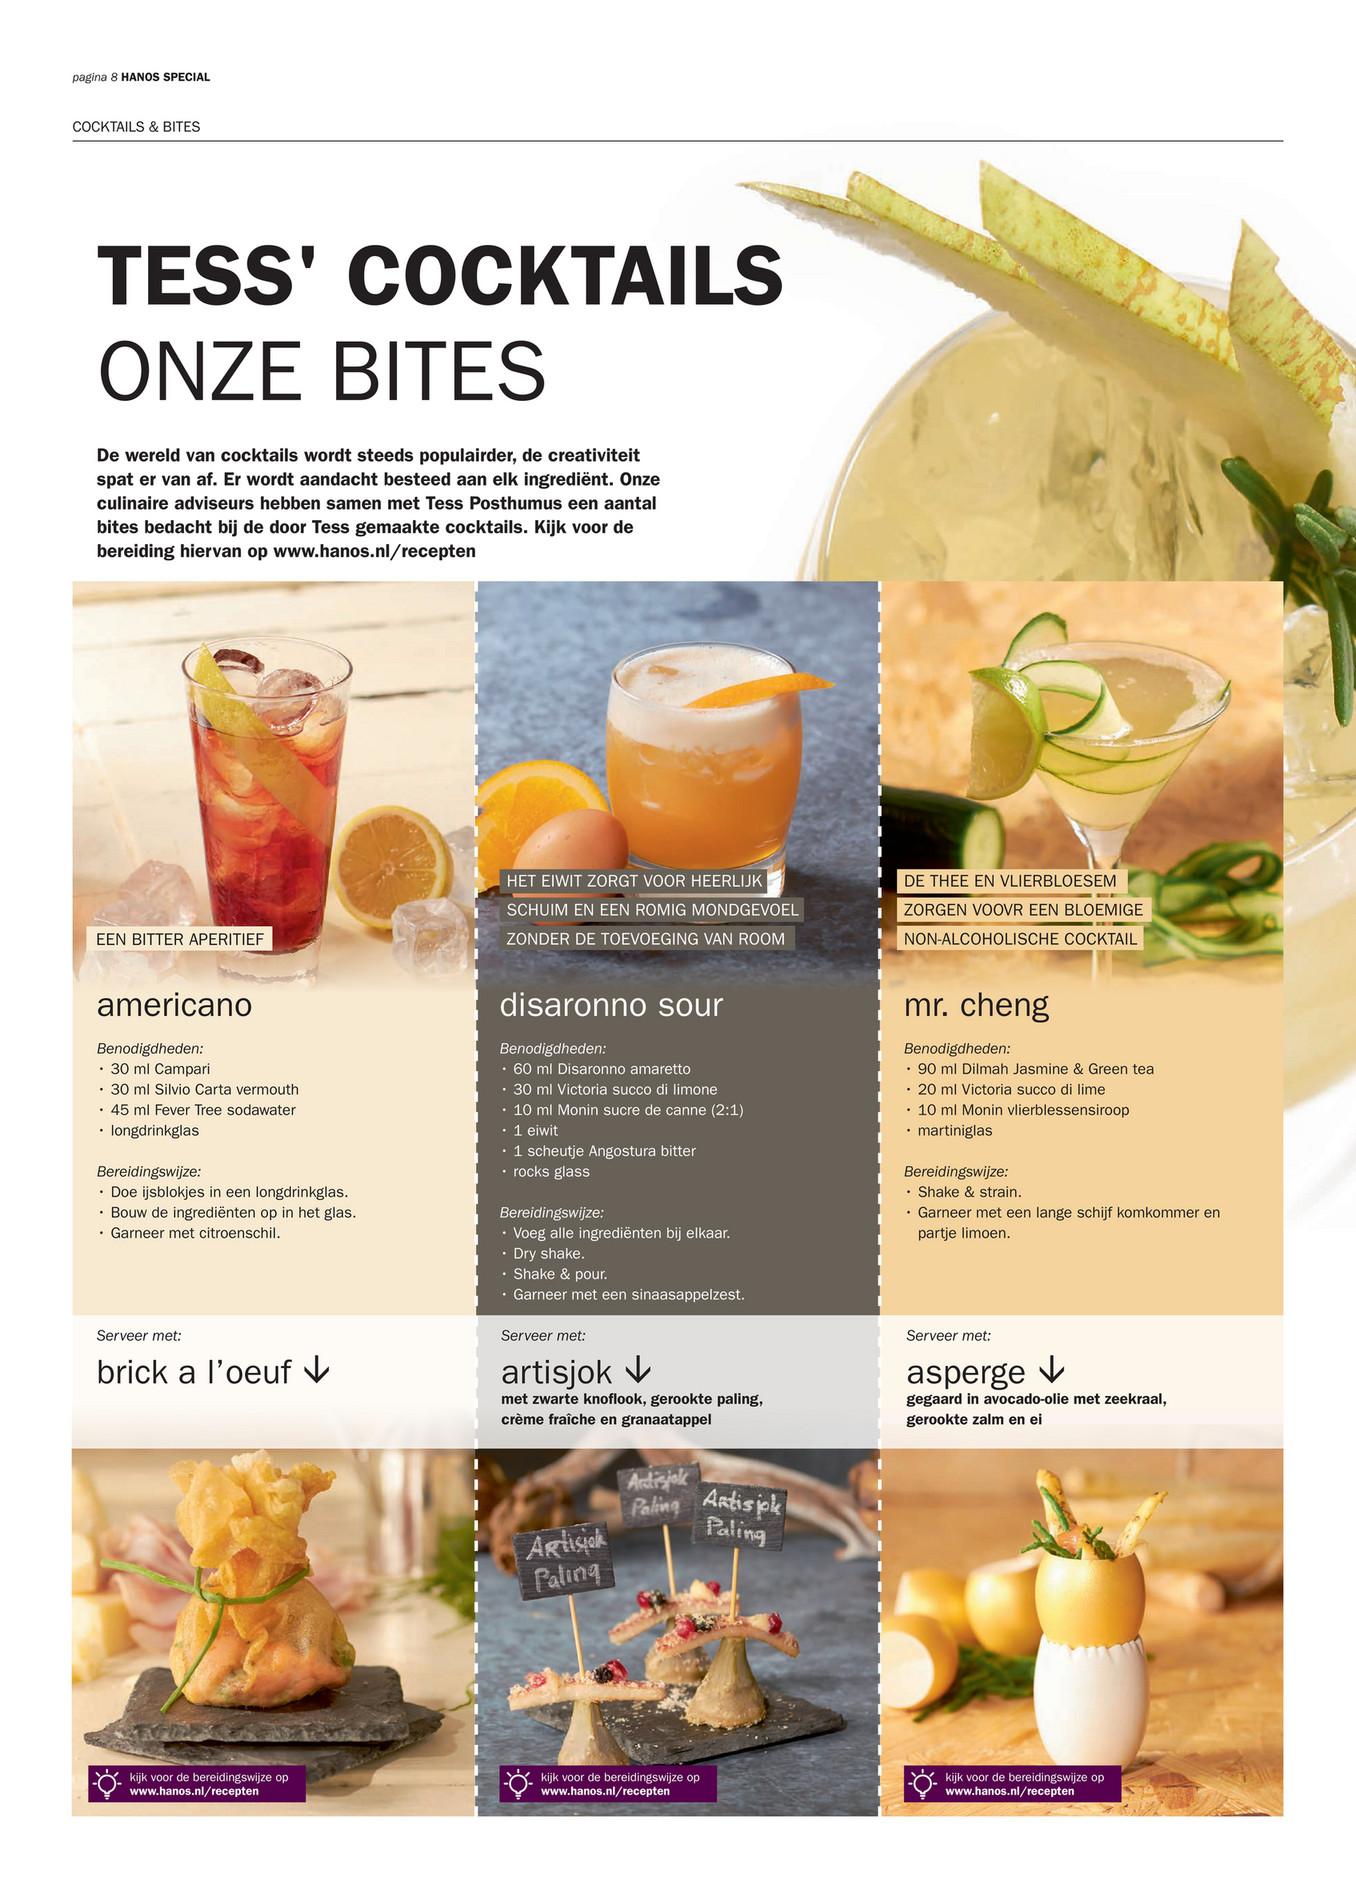 Hanos voorjaarsspecial 01 2016 pagina 8 9 for Cocktail 69 special